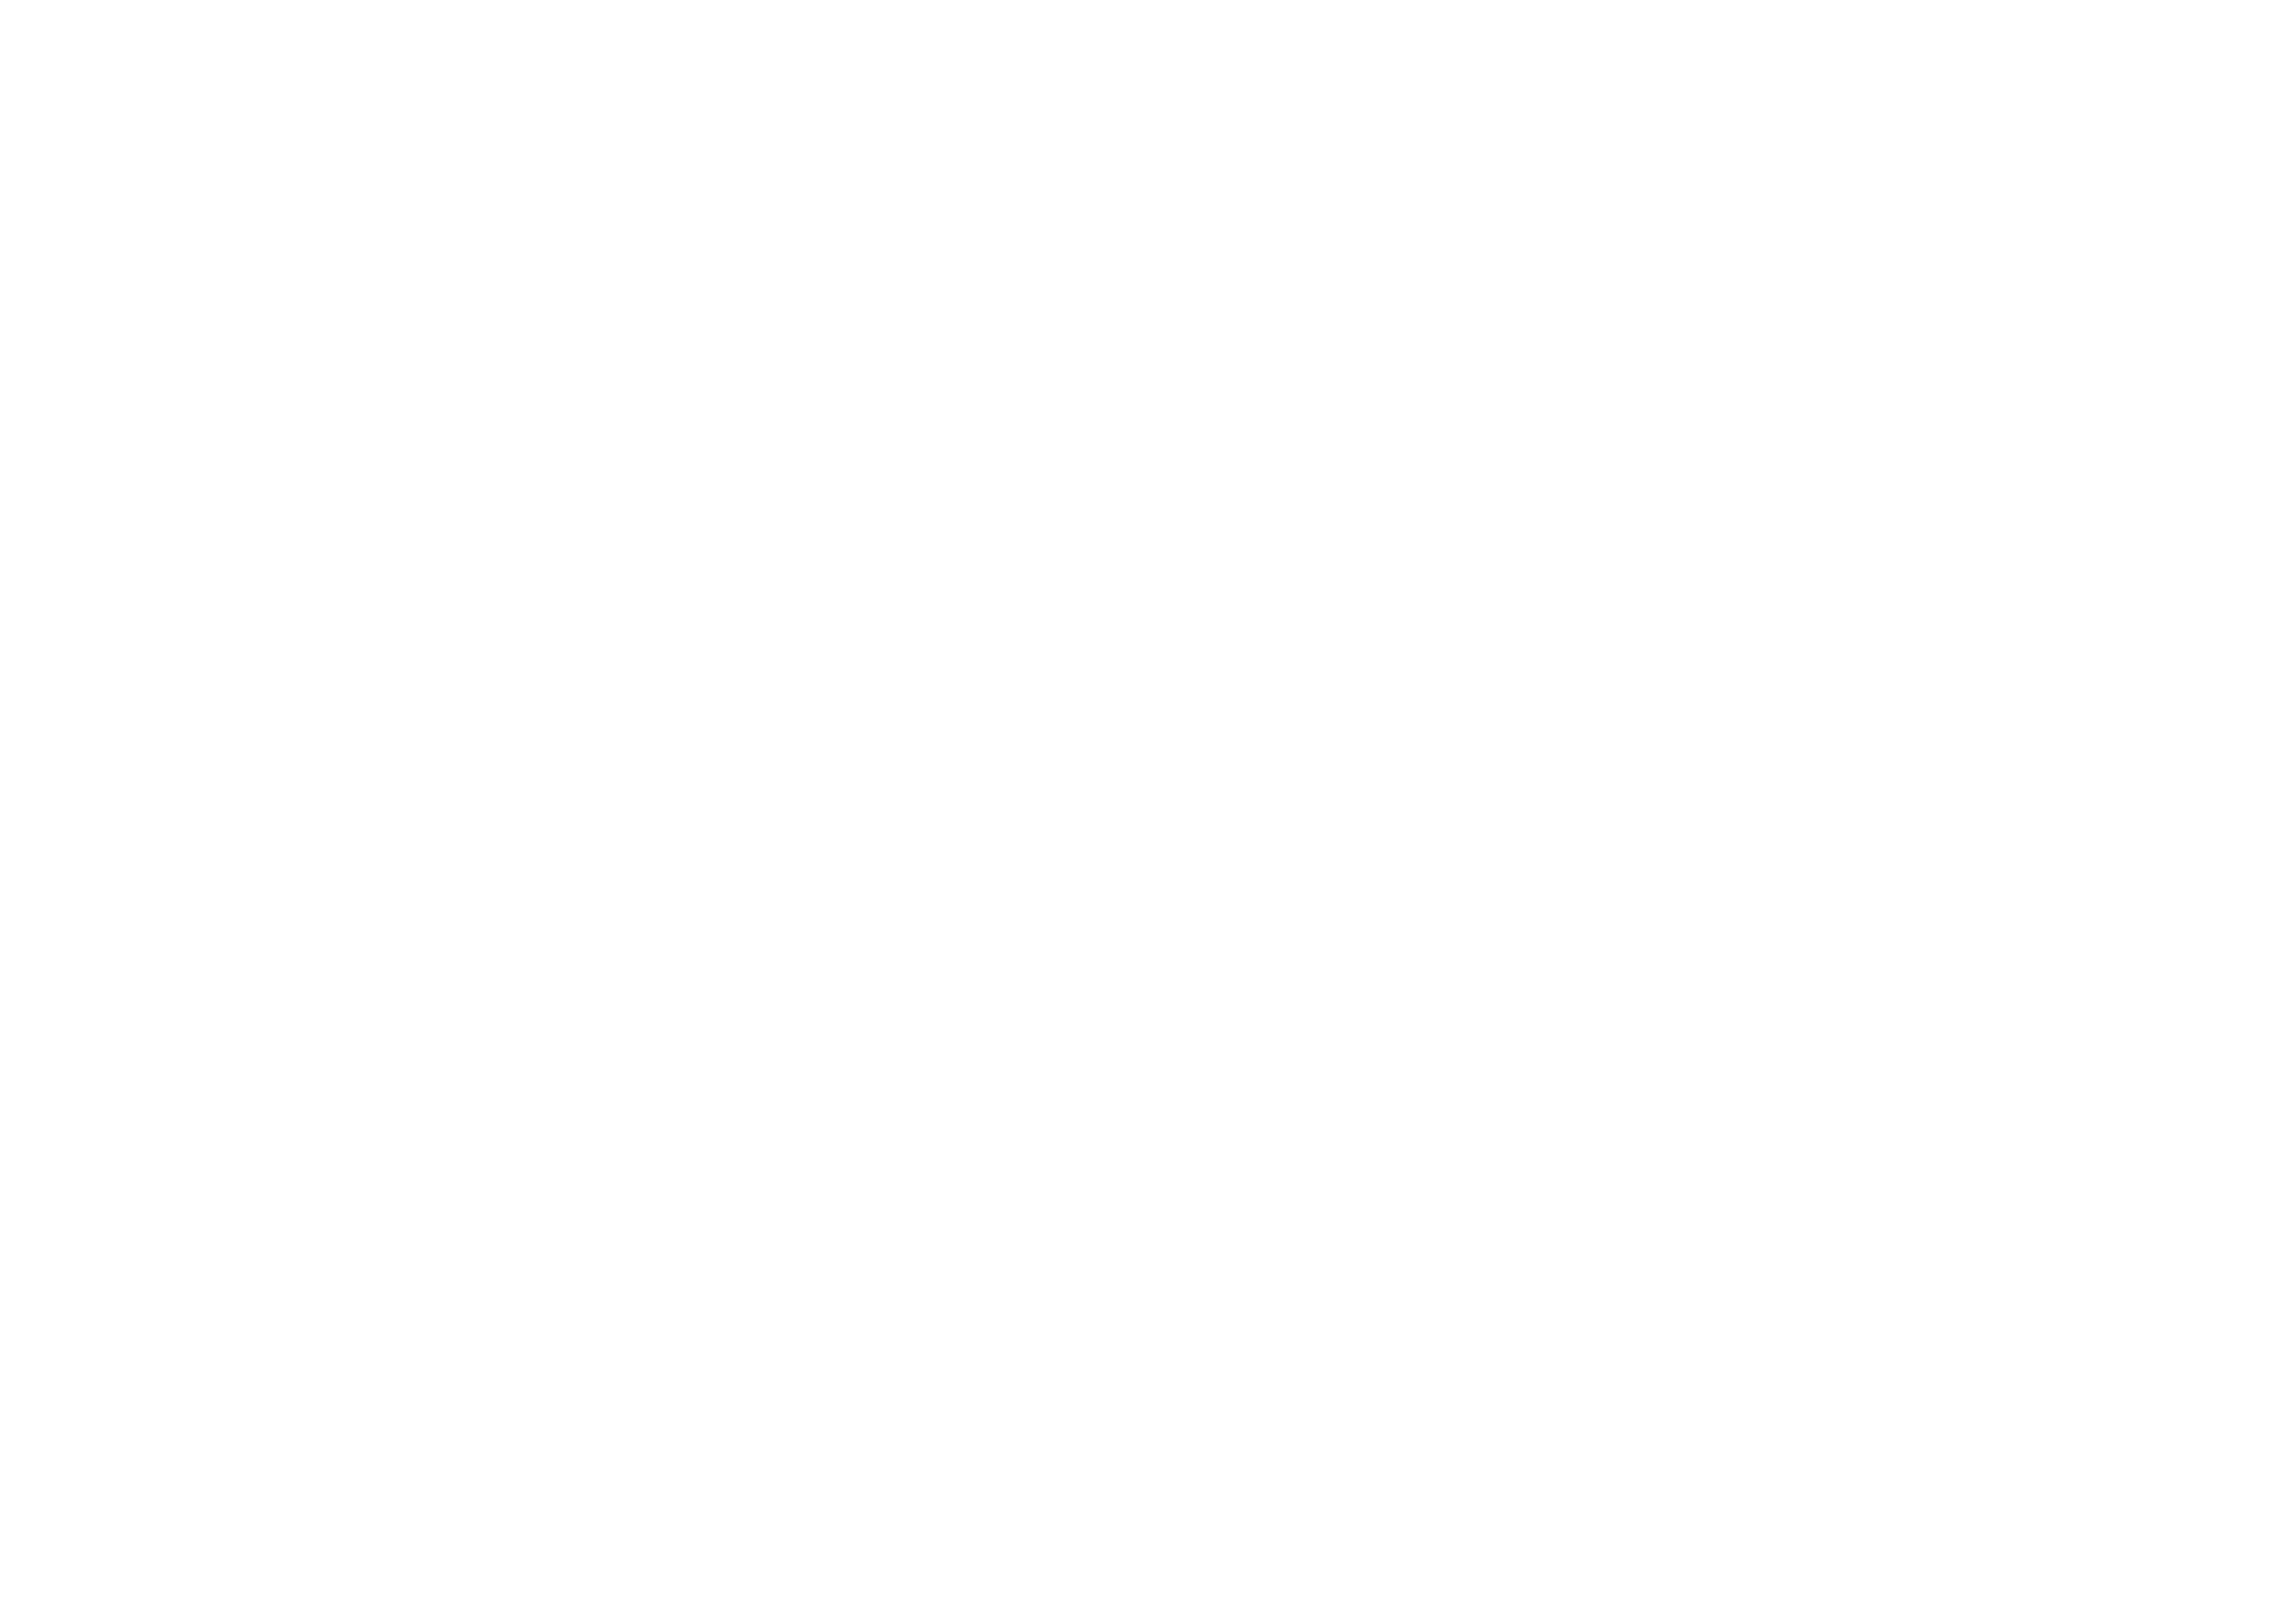 rhrc layout3-03.png